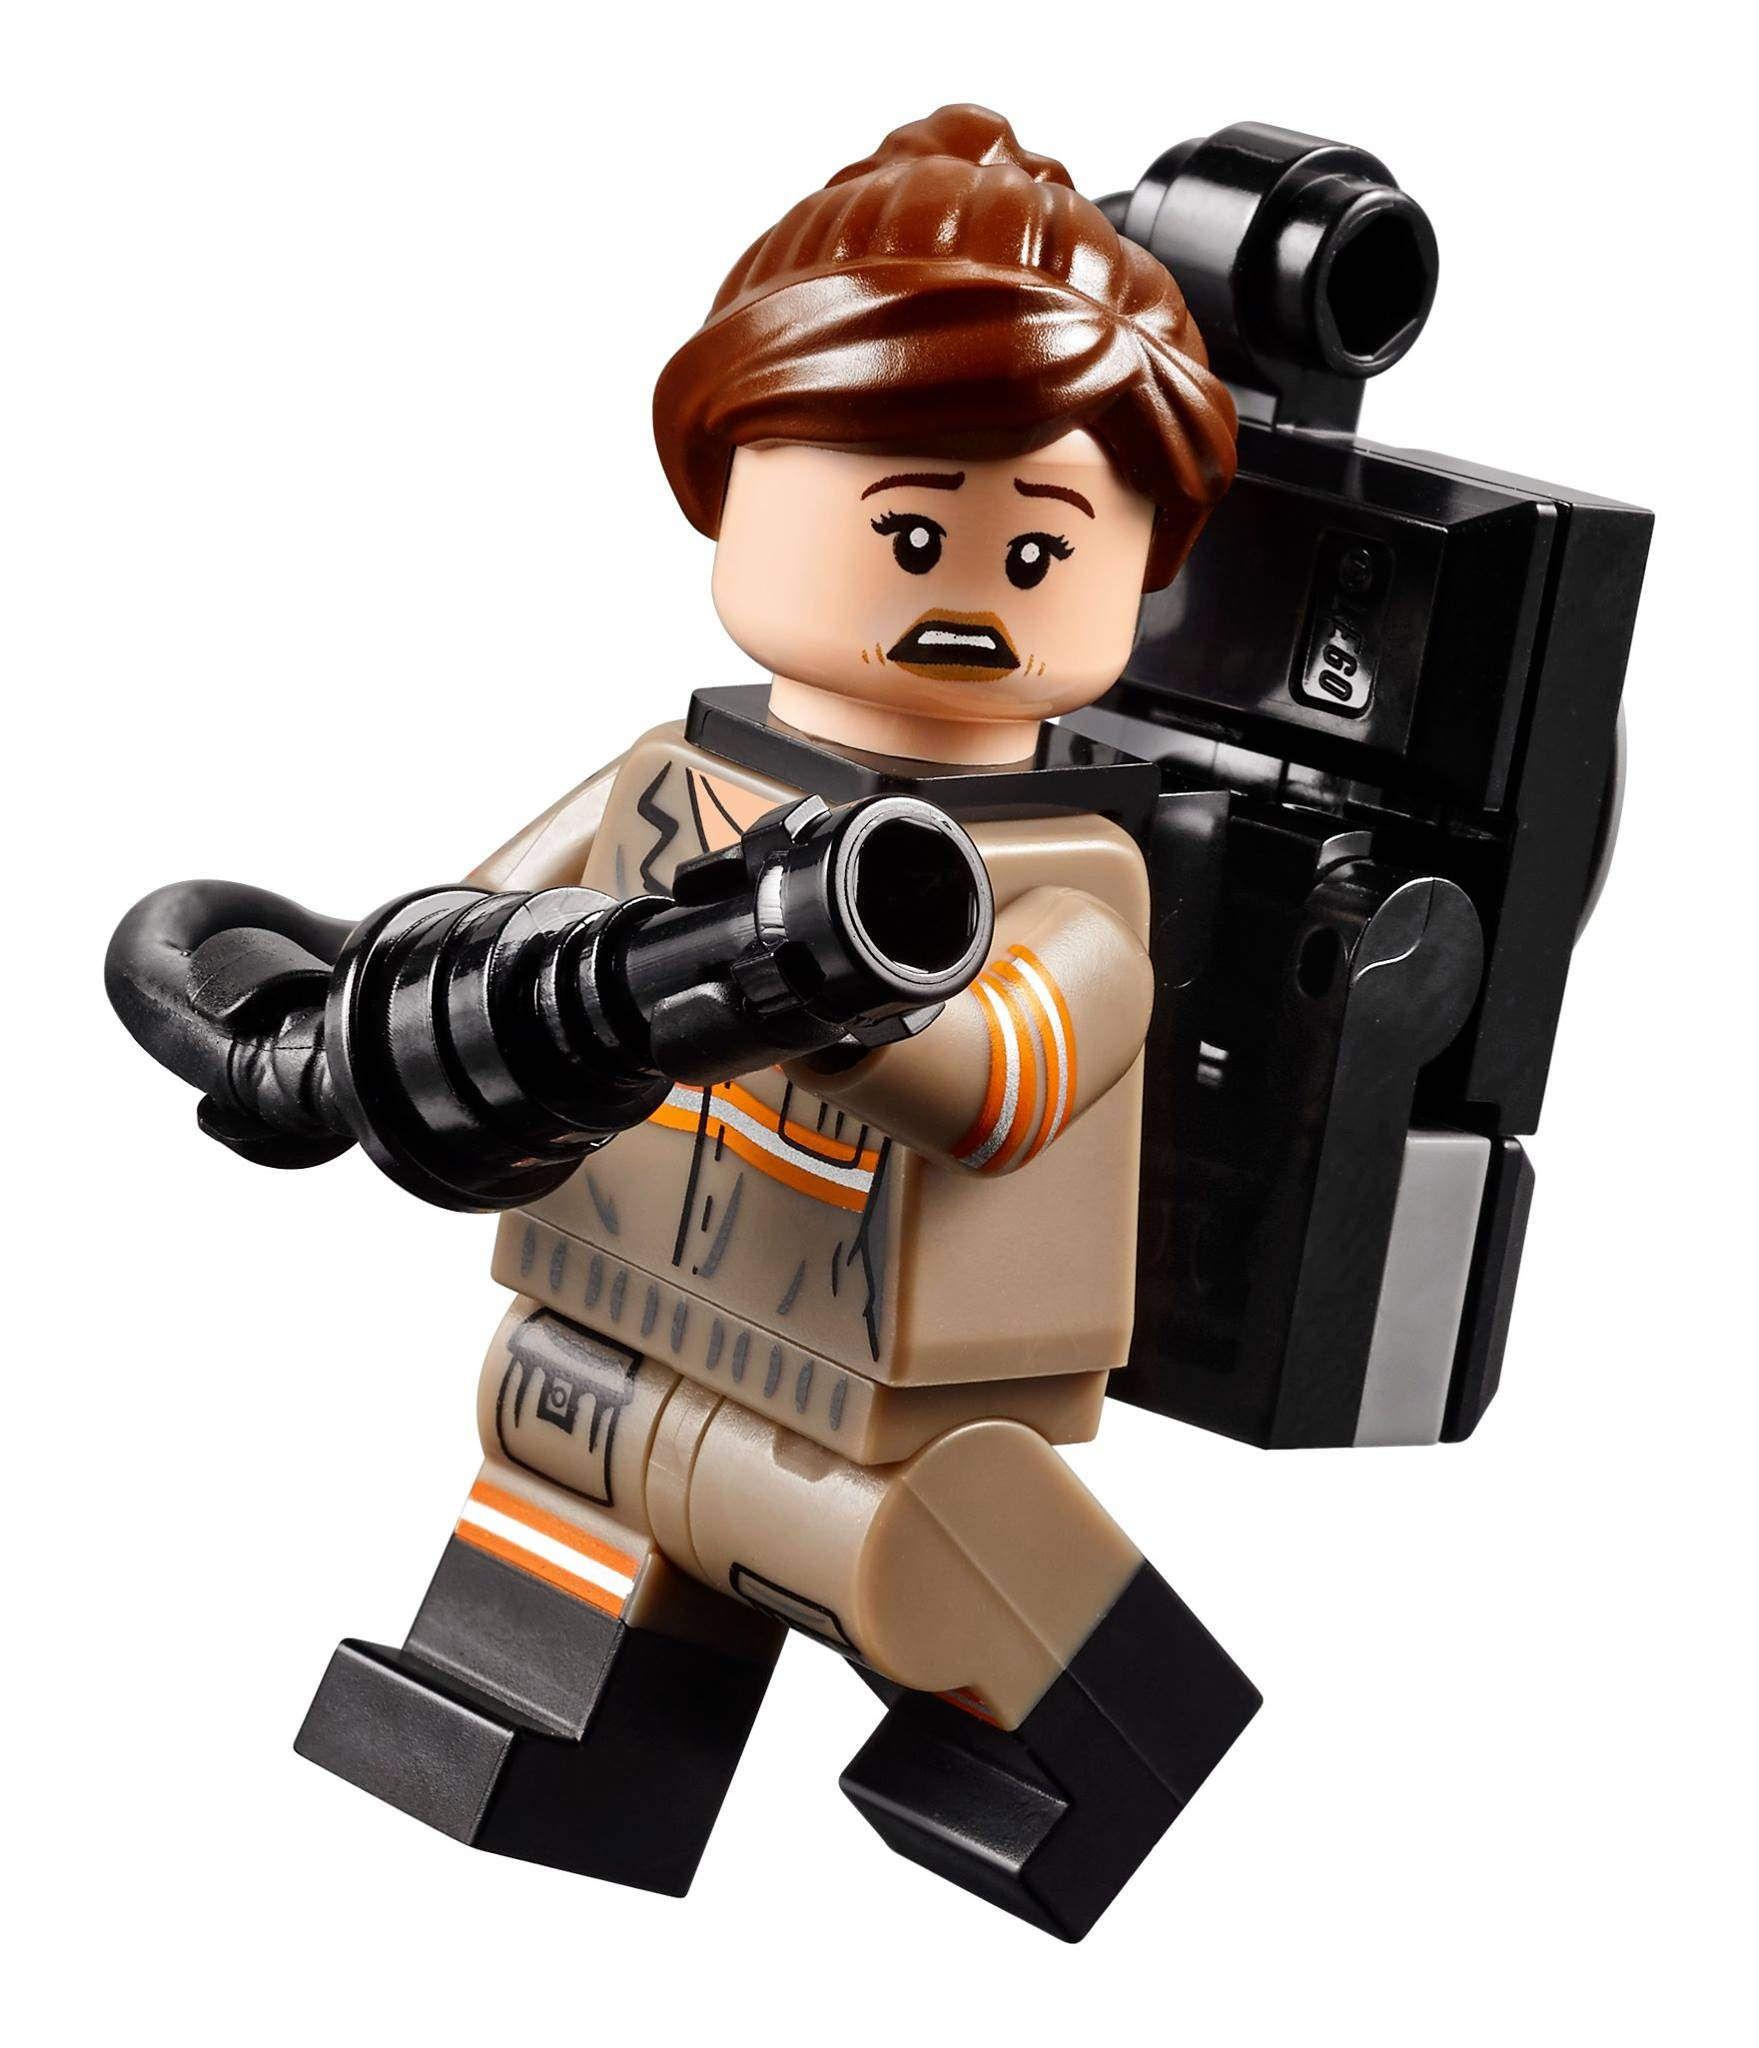 Lego Ghostbusters 75828 Ecto 1 Ecto 2 Ghostbusters Lego Lego Girls